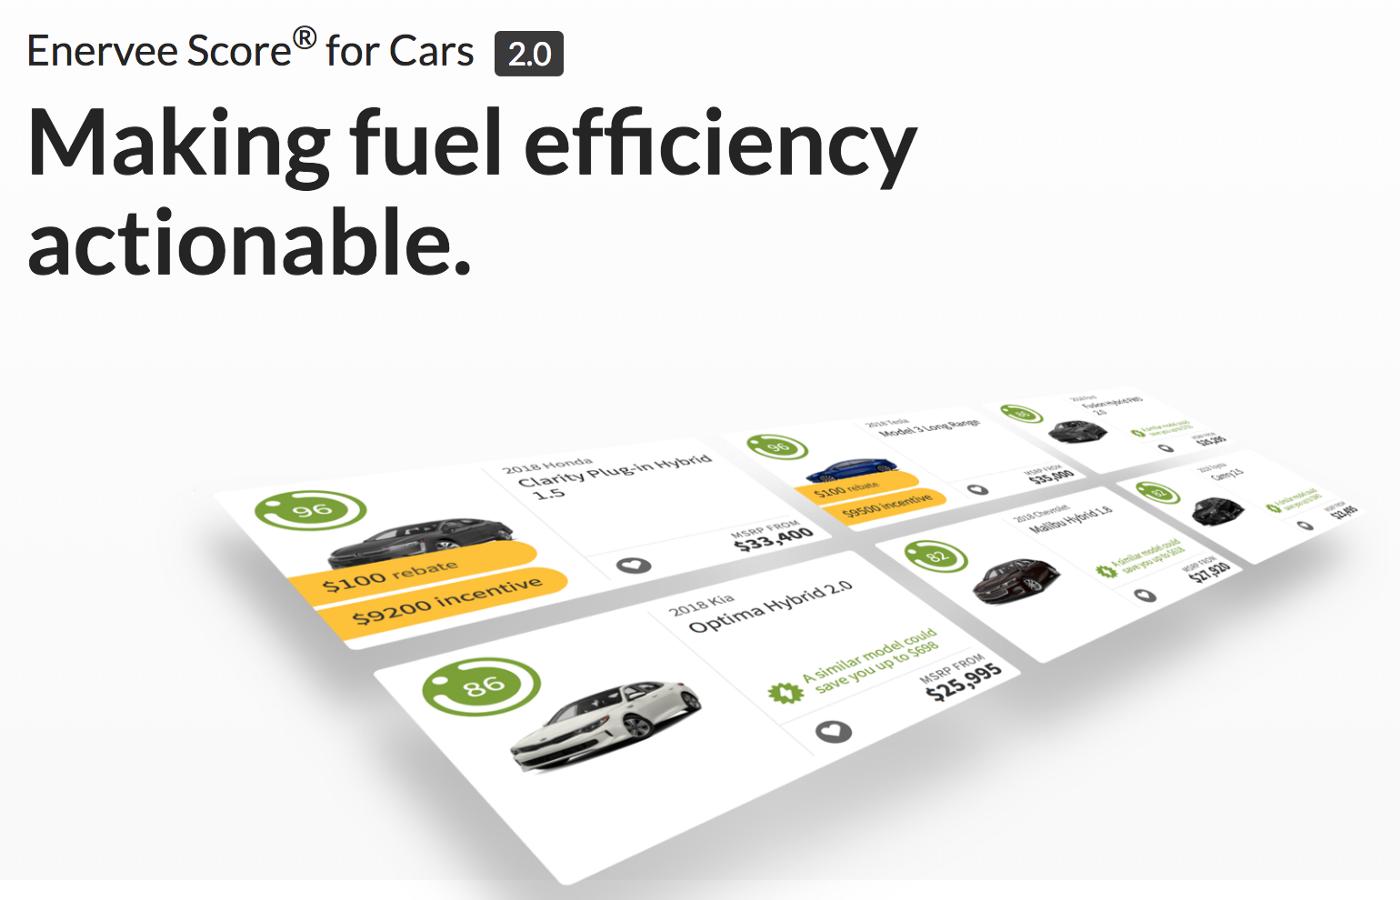 Enervee Score for Cars